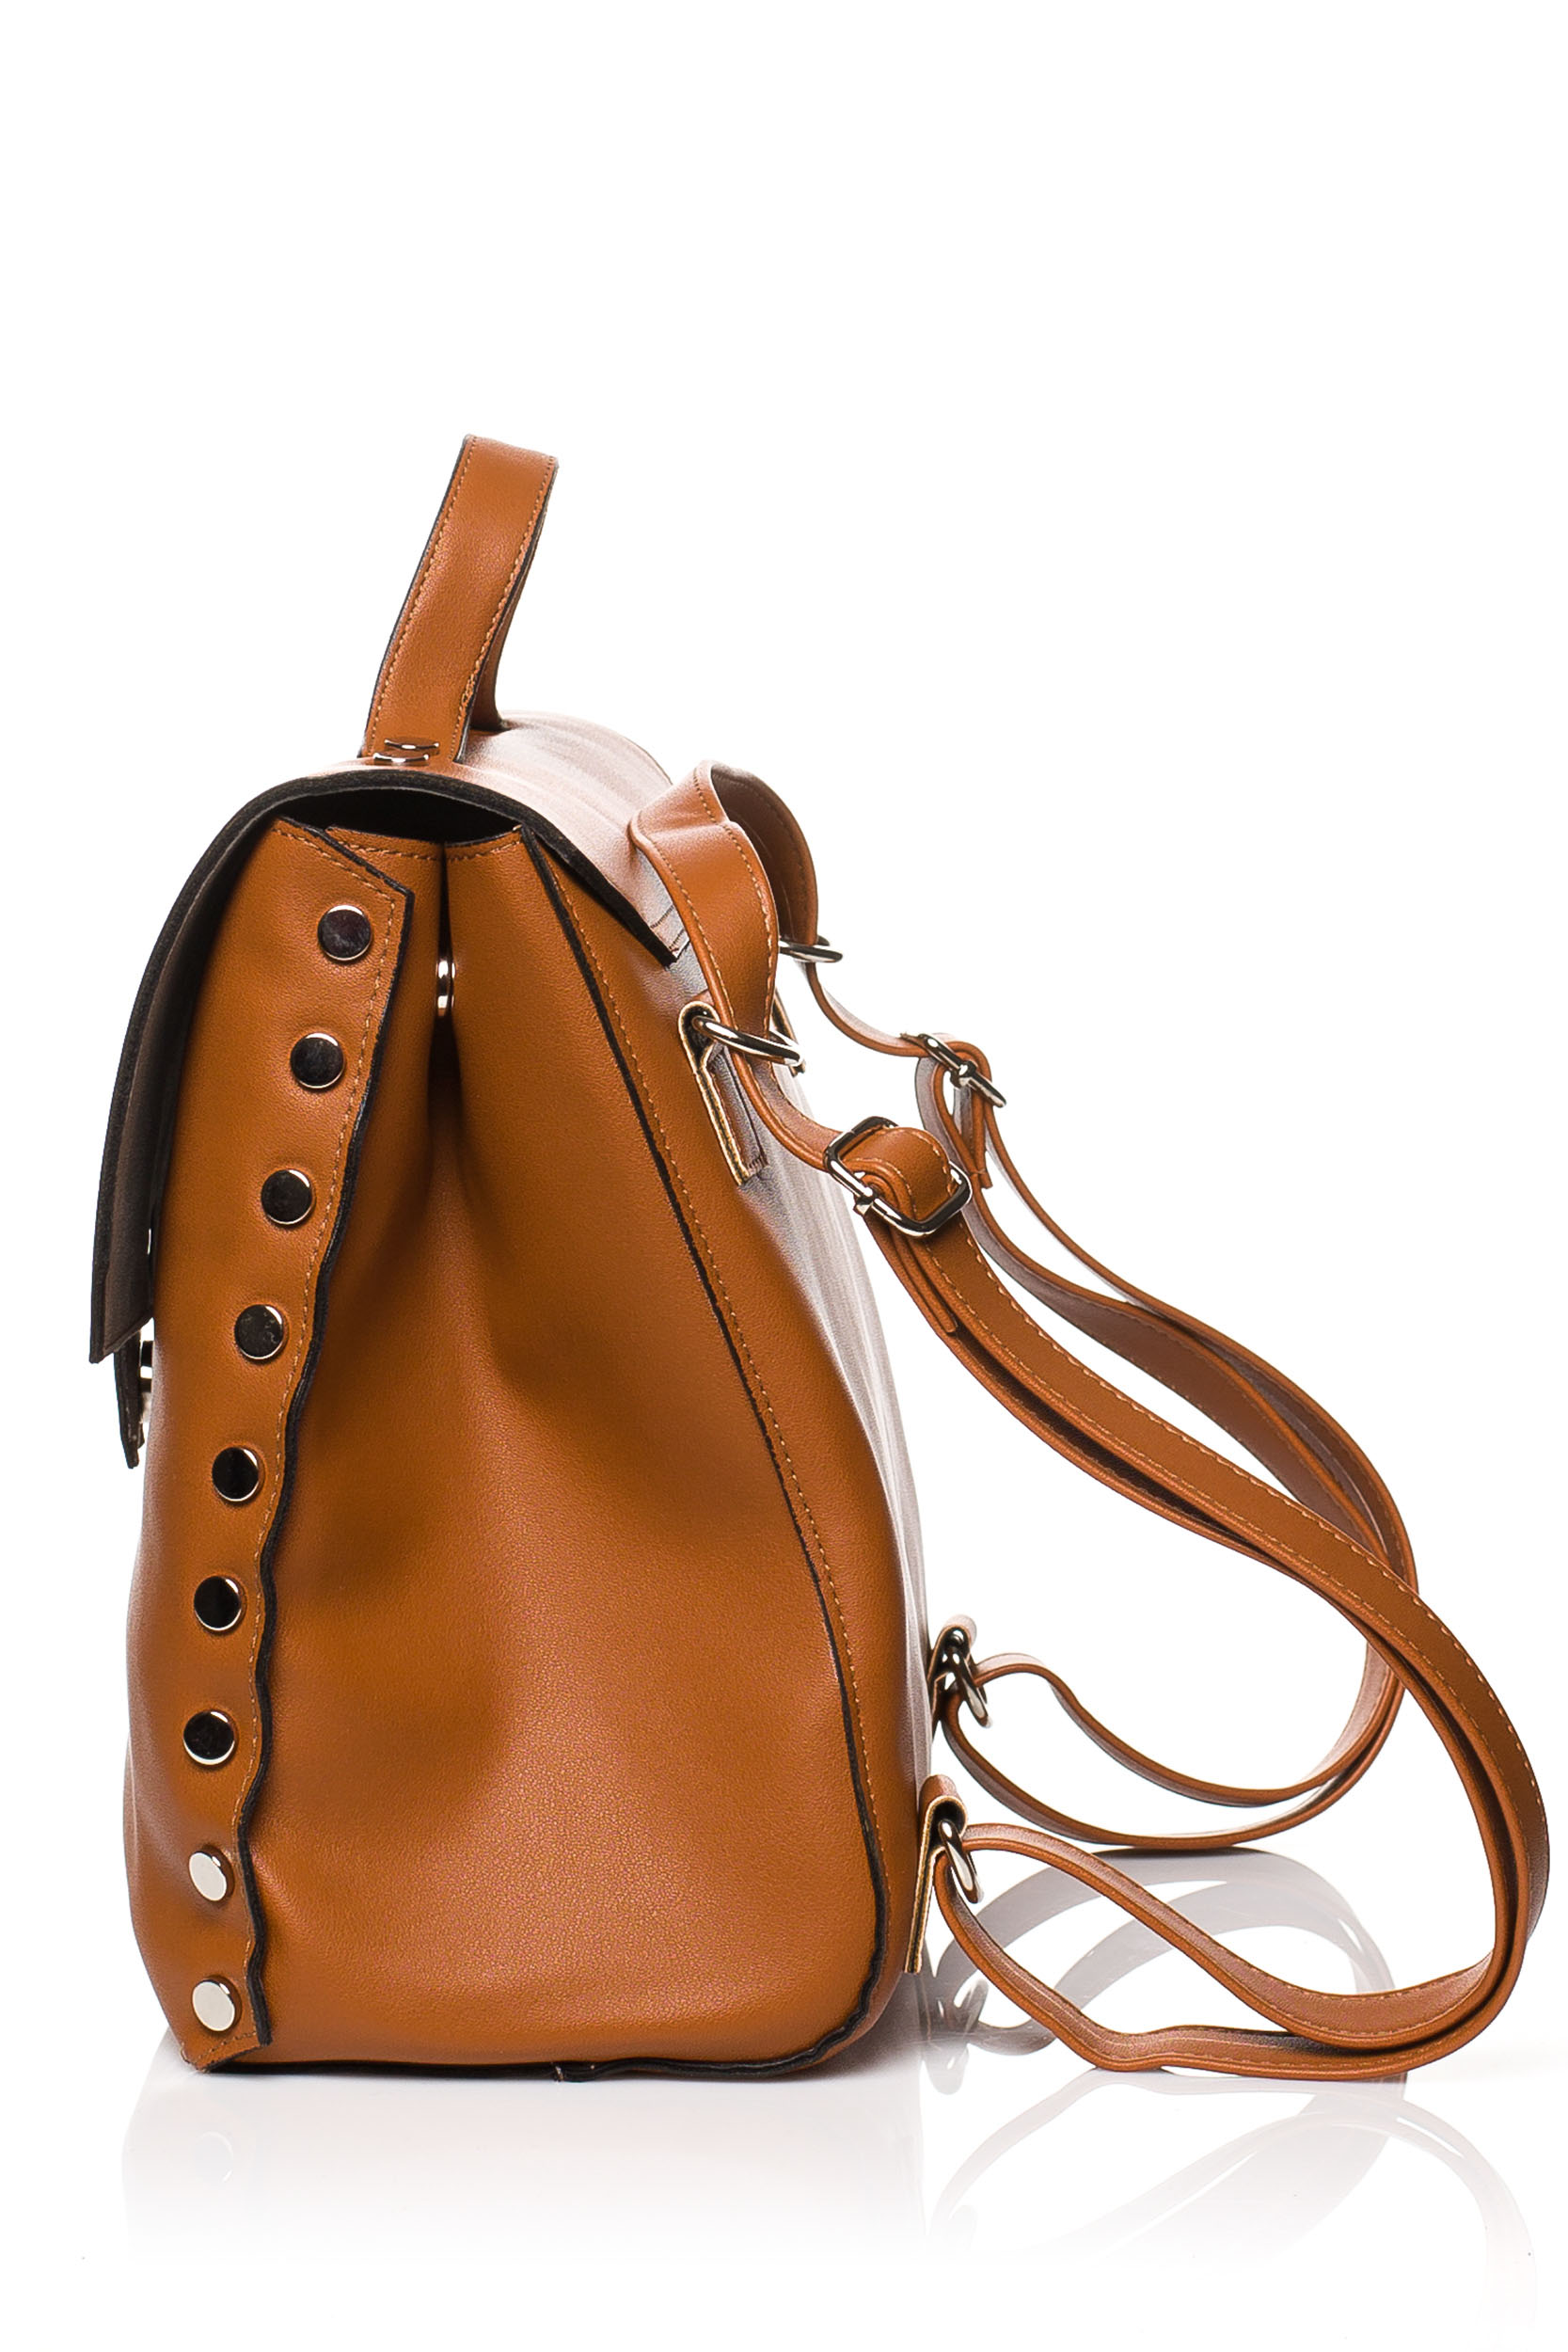 CM3831 Mała elegancka torebka - ruda